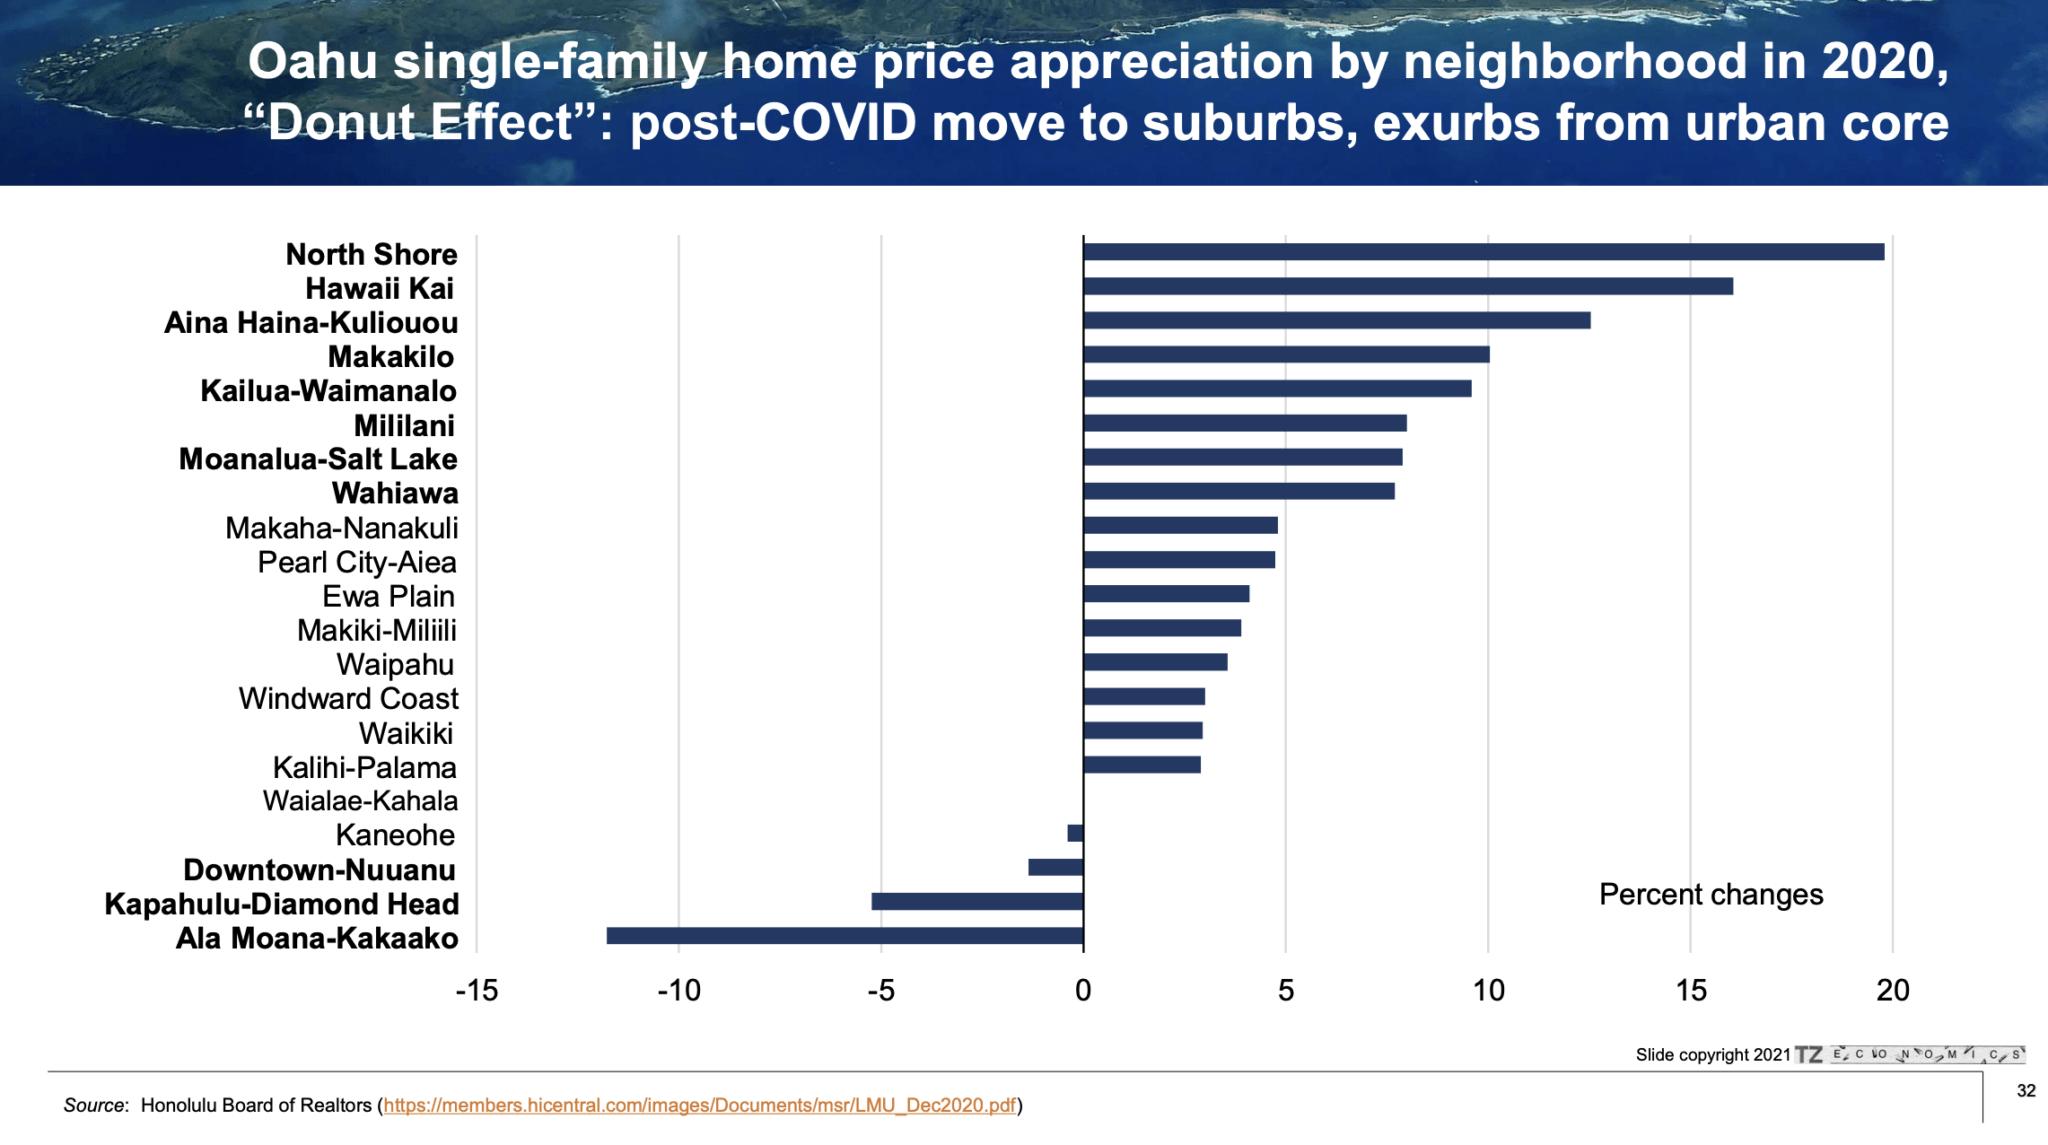 oahu single family home price appreciation 2020